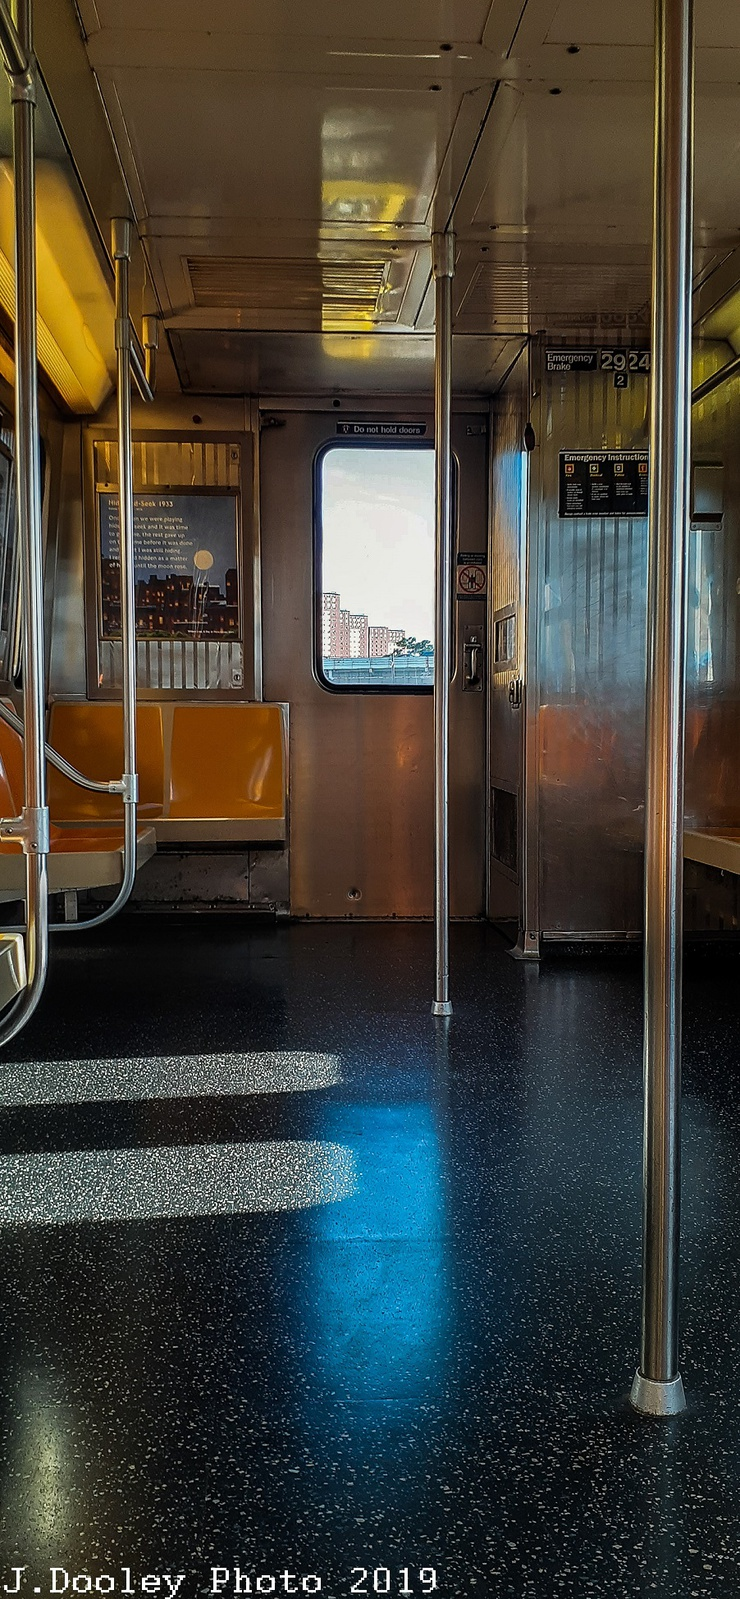 (340k, 1044x874)<br><b>Country:</b> United States<br><b>City:</b> New York<br><b>System:</b> New York City Transit<br><b>Line:</b> BMT Myrtle Avenue Line<br><b>Location:</b> Knickerbocker Avenue <br><b>Car:</b> BMT Elevated Gate Car  <br><b>Photo by:</b> Joel Shanus<br><b>Viewed (this week/total):</b> 0 / 1960